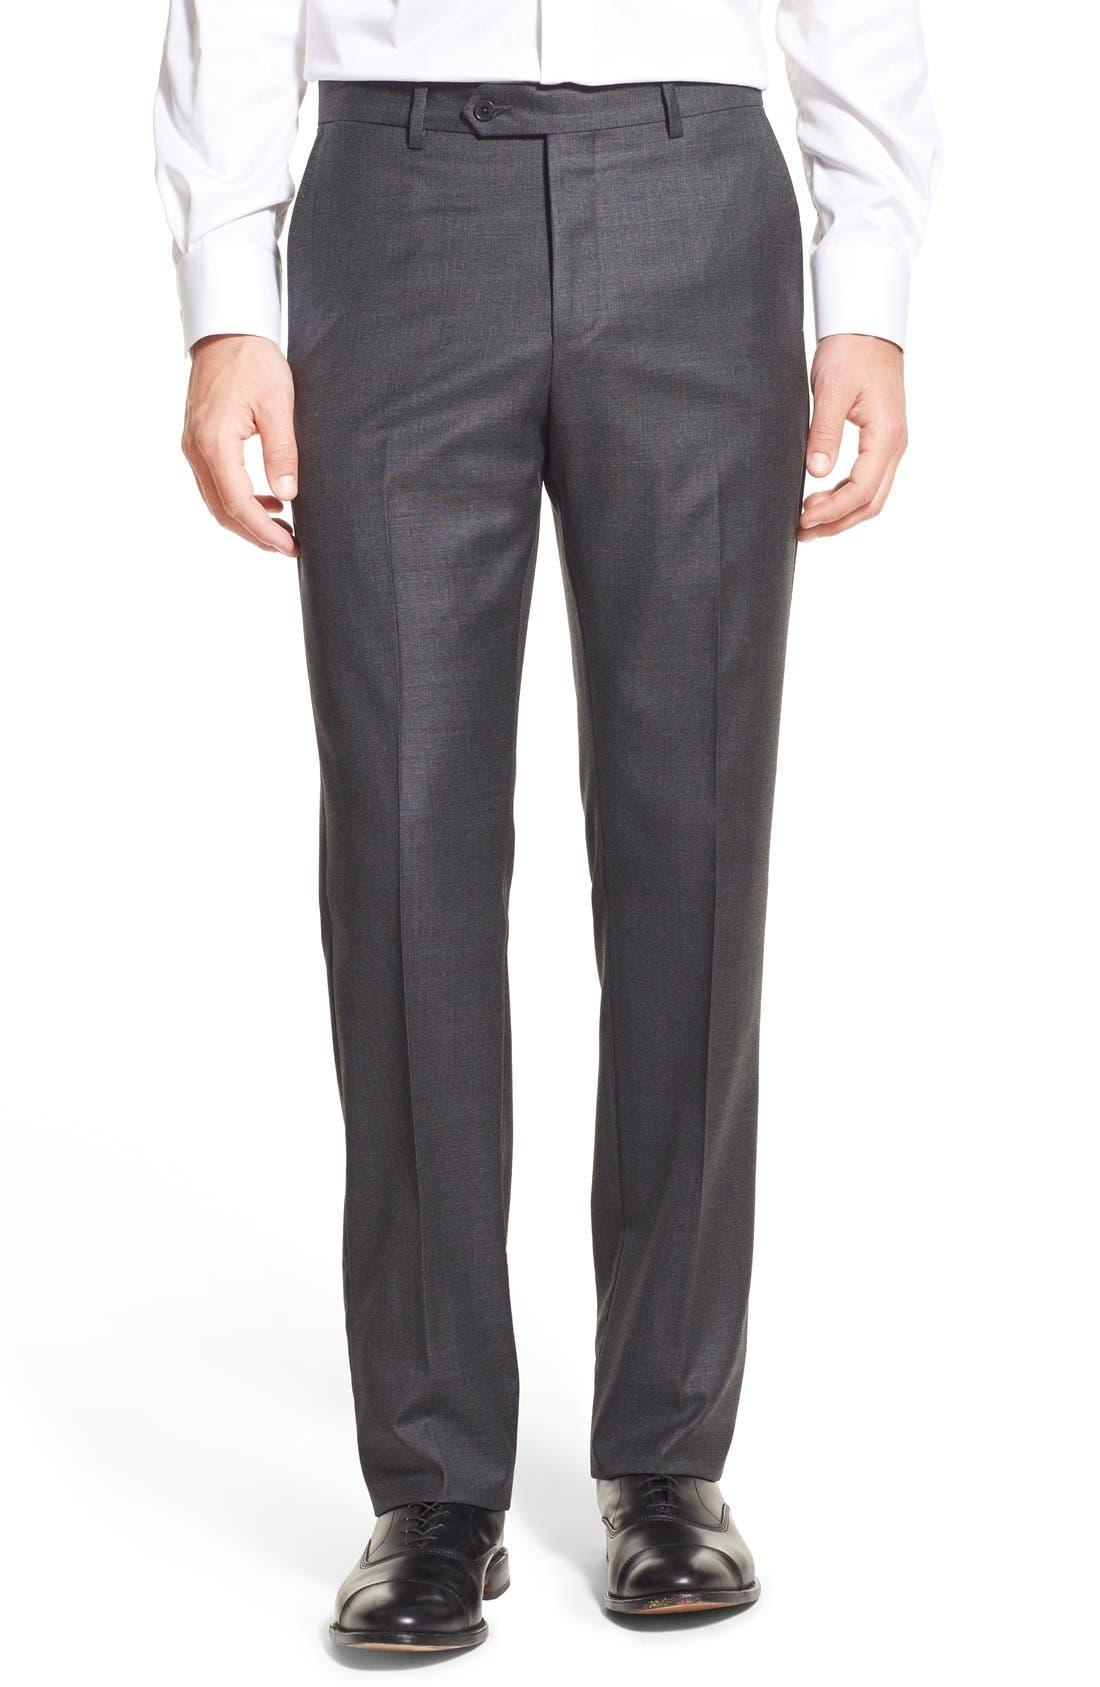 MONTE ROSSO Flat Front Sharkskin Wool Trousers